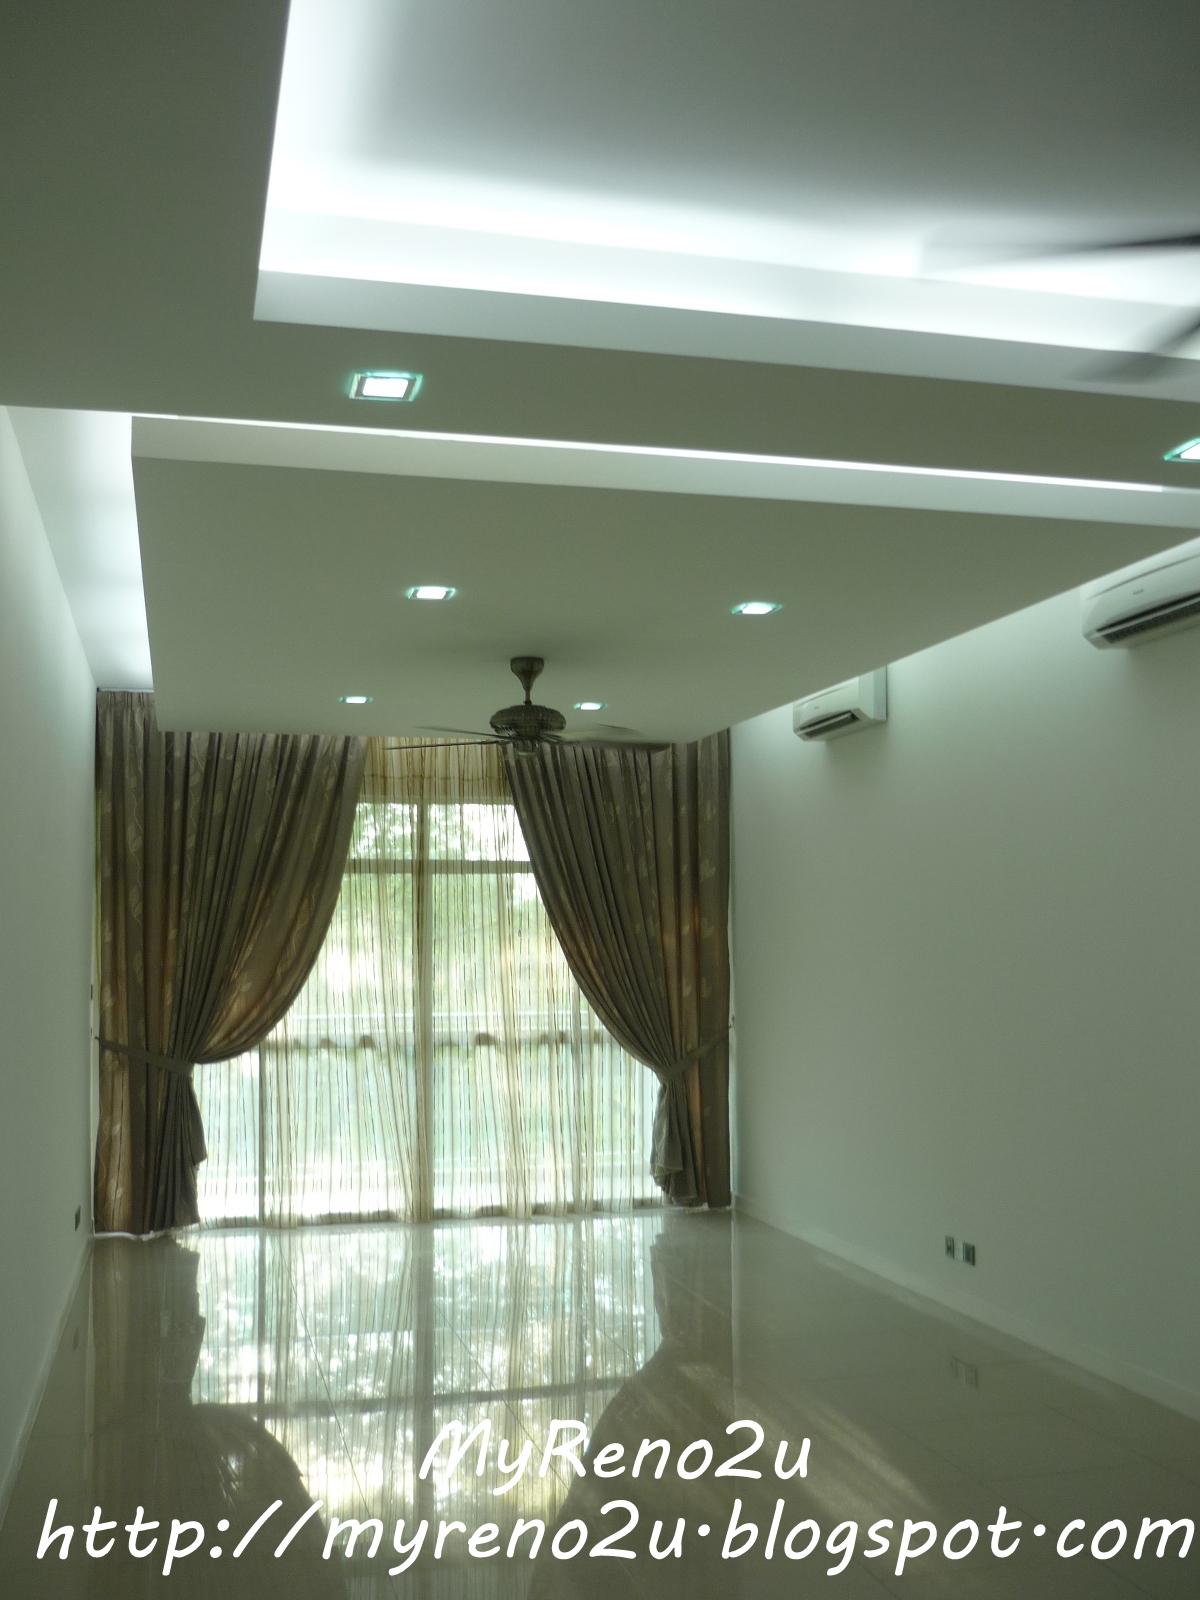 Plaster ceiling  Subang | MyReno2U